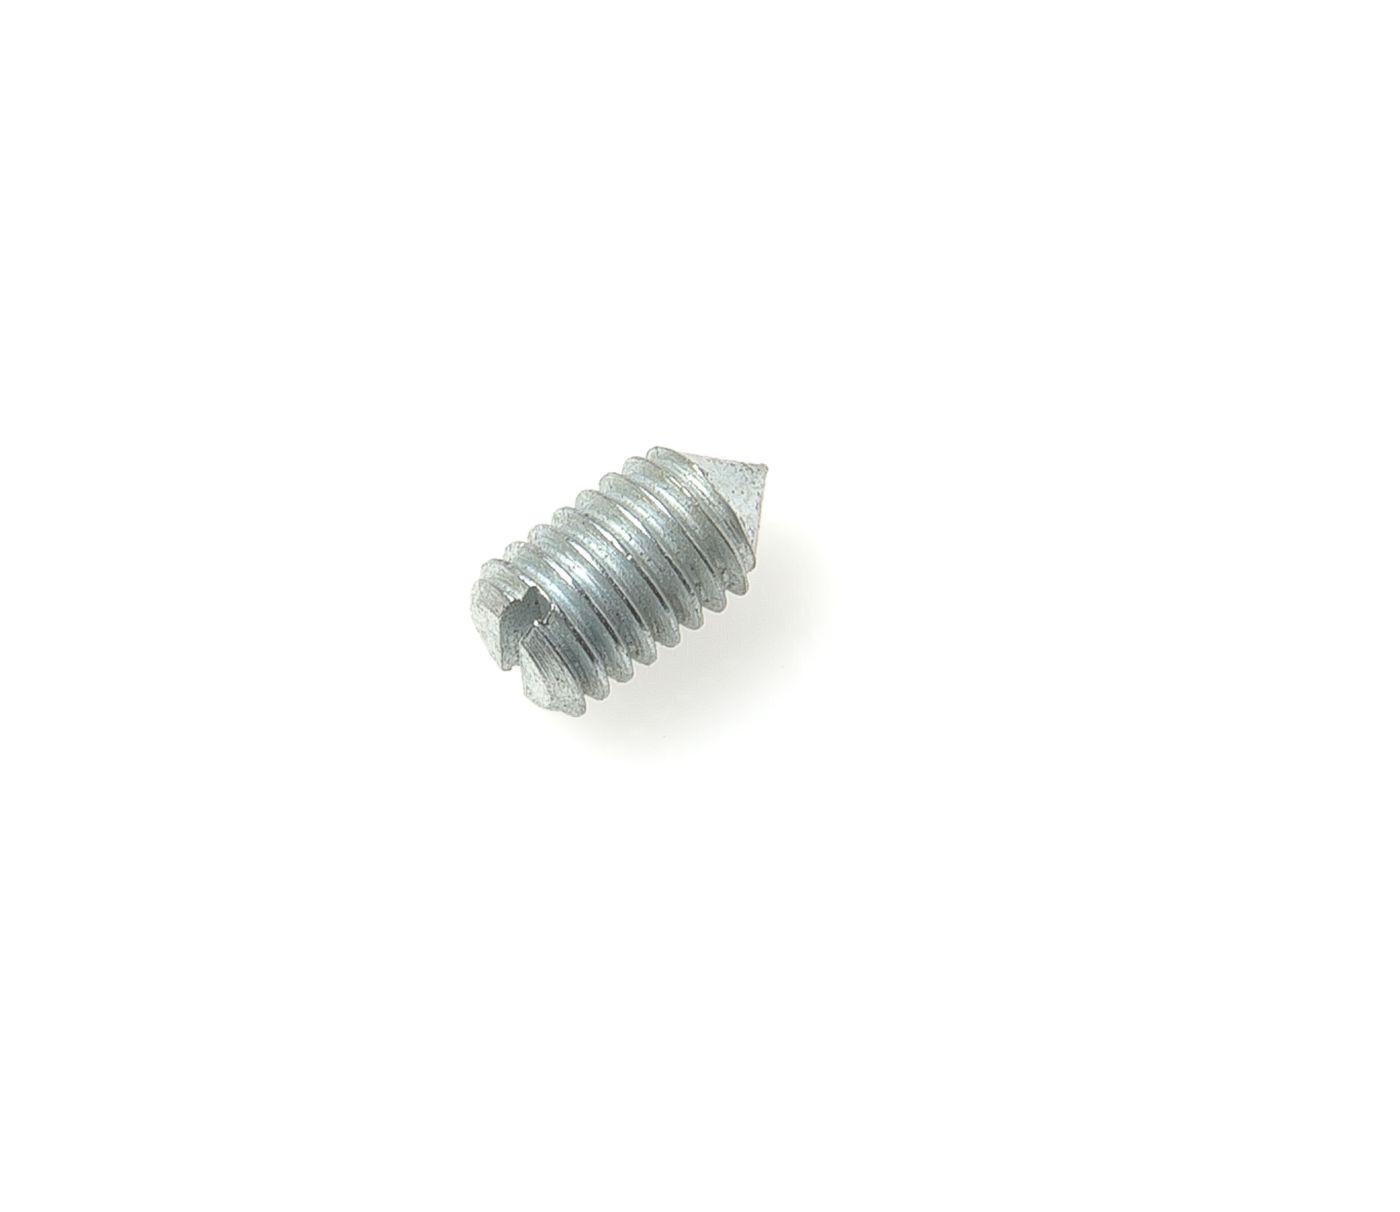 Grub screw